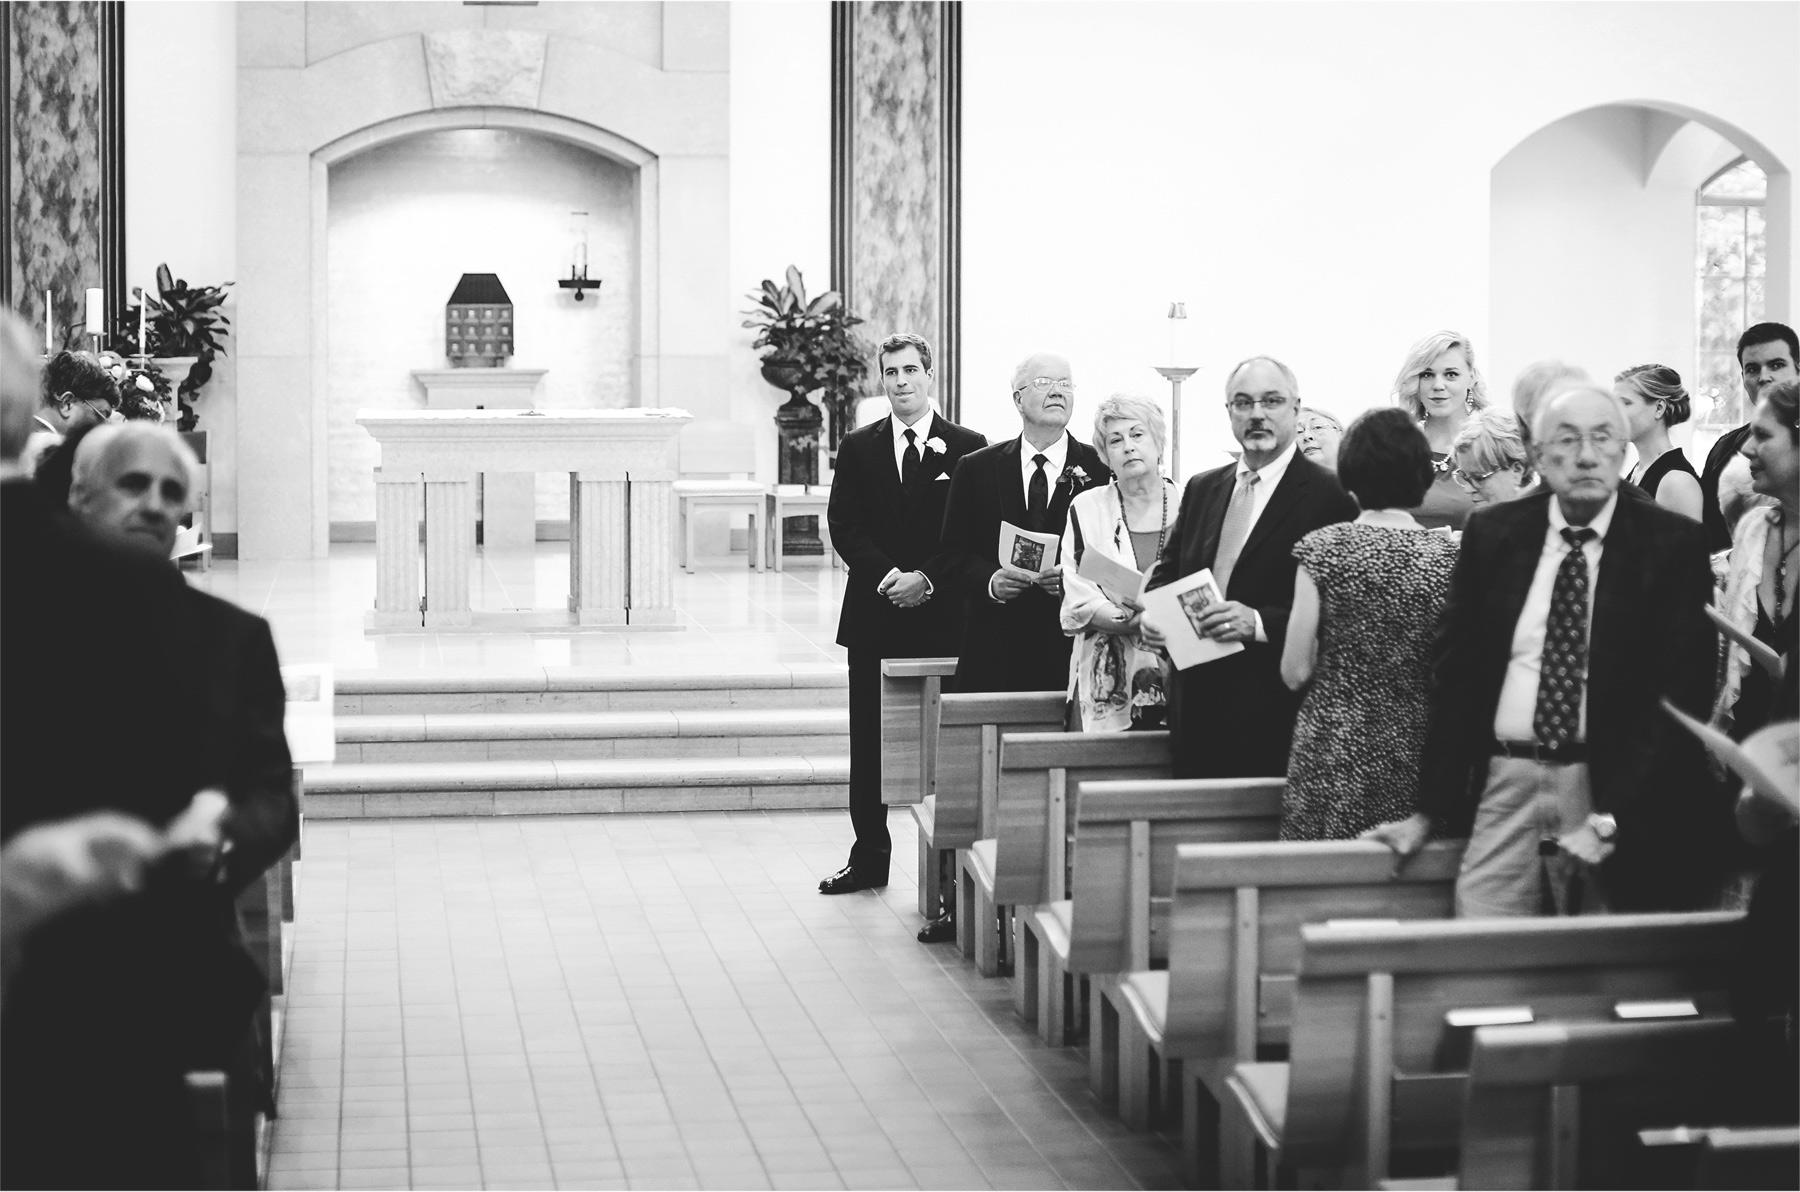 14-Edina-Minnesota-Wedding-Photographer-by-Andrew-Vick-Photography-Summer-Our-Lady-of-Grace-Catholic-Parish-Church-Ceremony-Groom-Black-White-Betsy-and-Jon.jpg